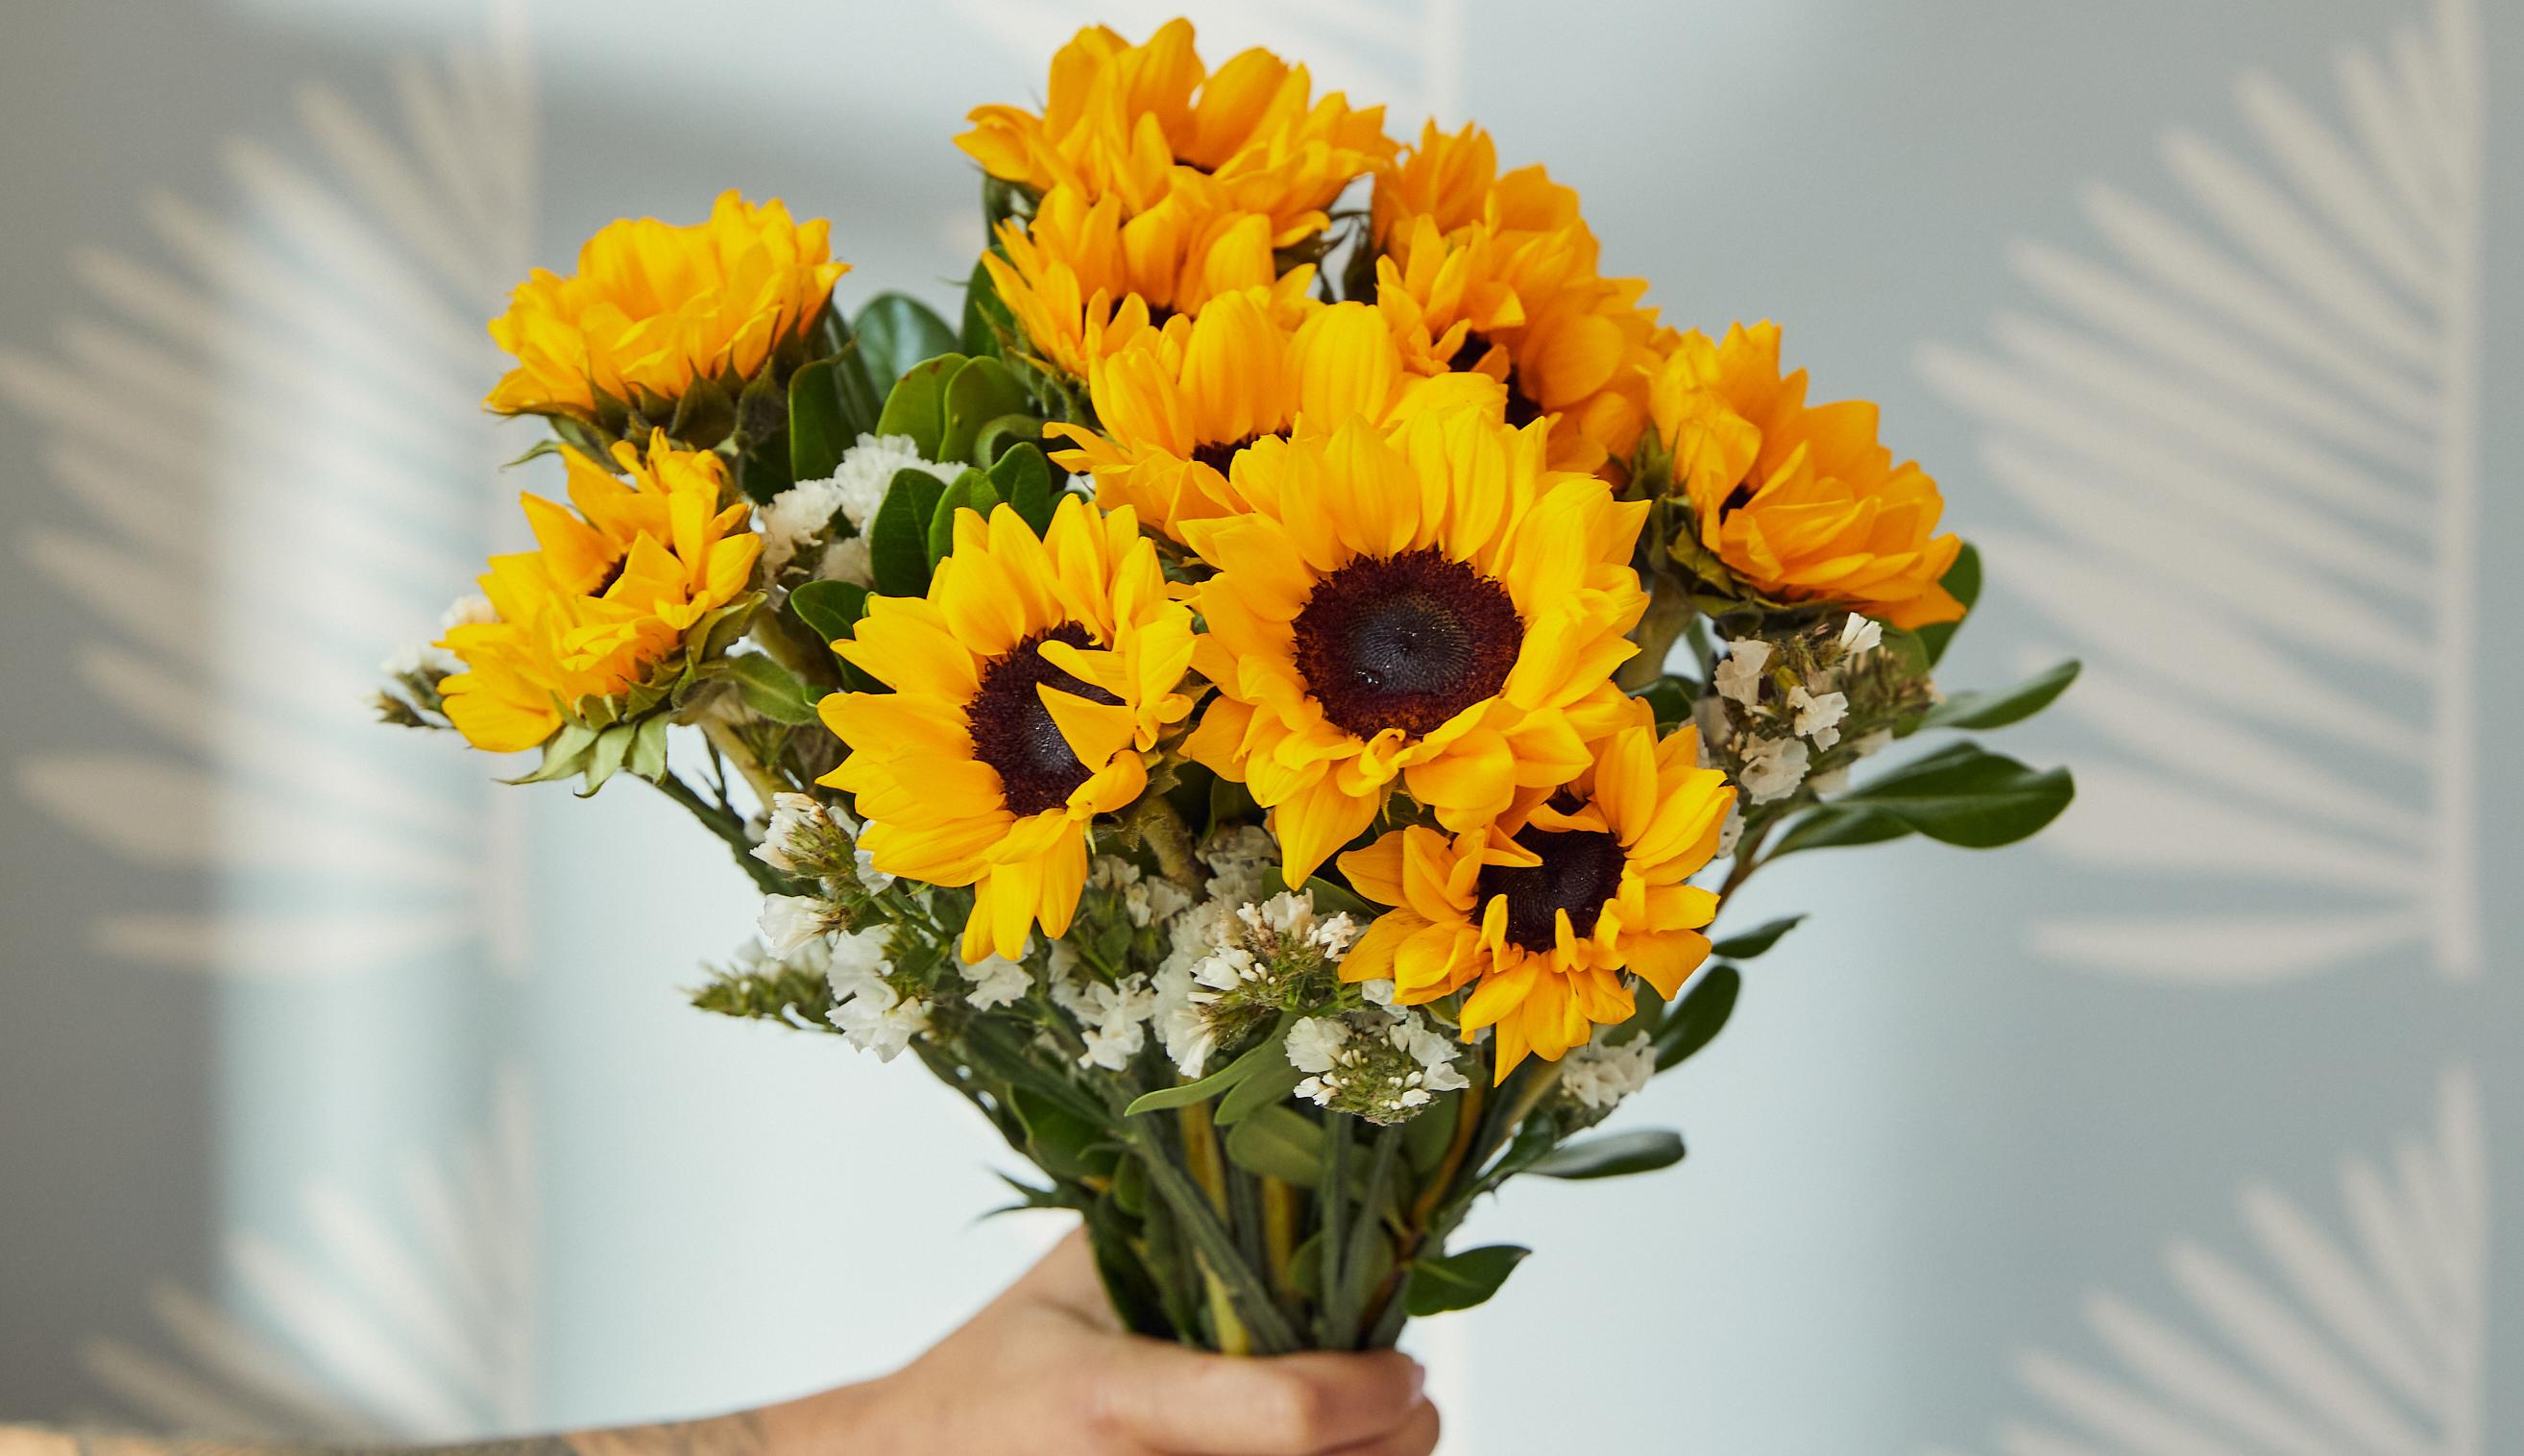 Hand holding sunflower bouquet